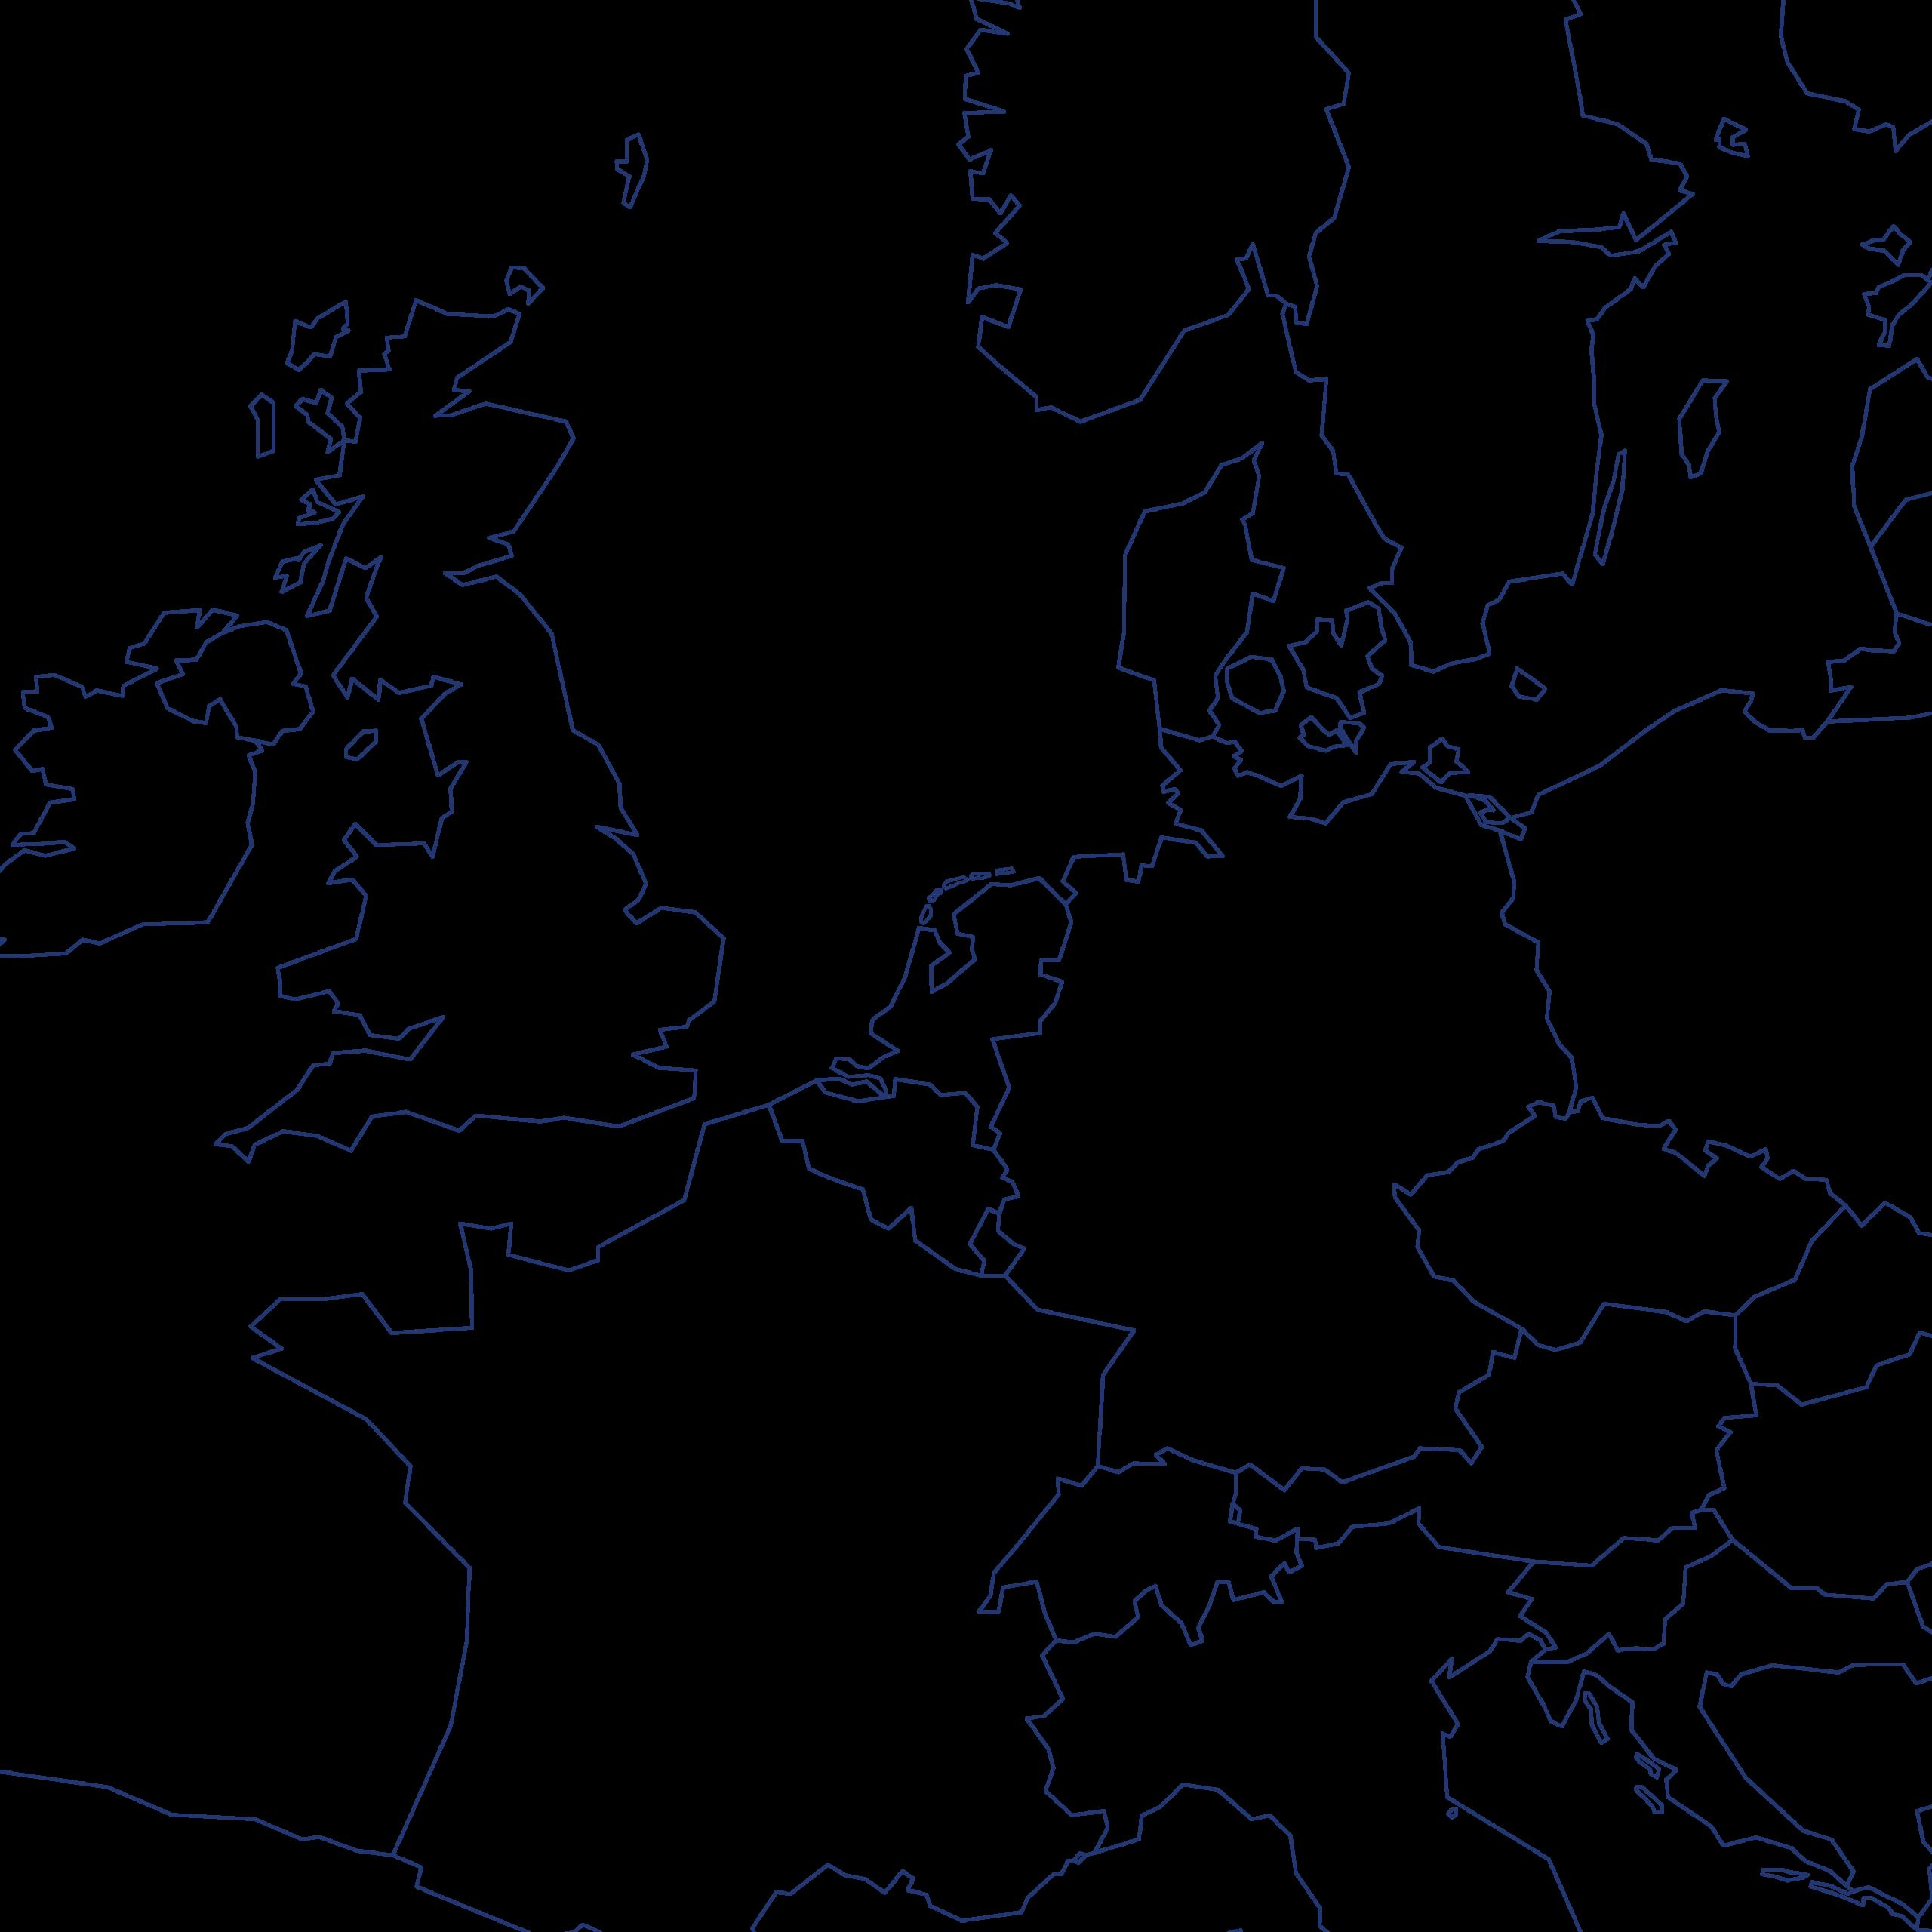 sealane eemshaven location map blue